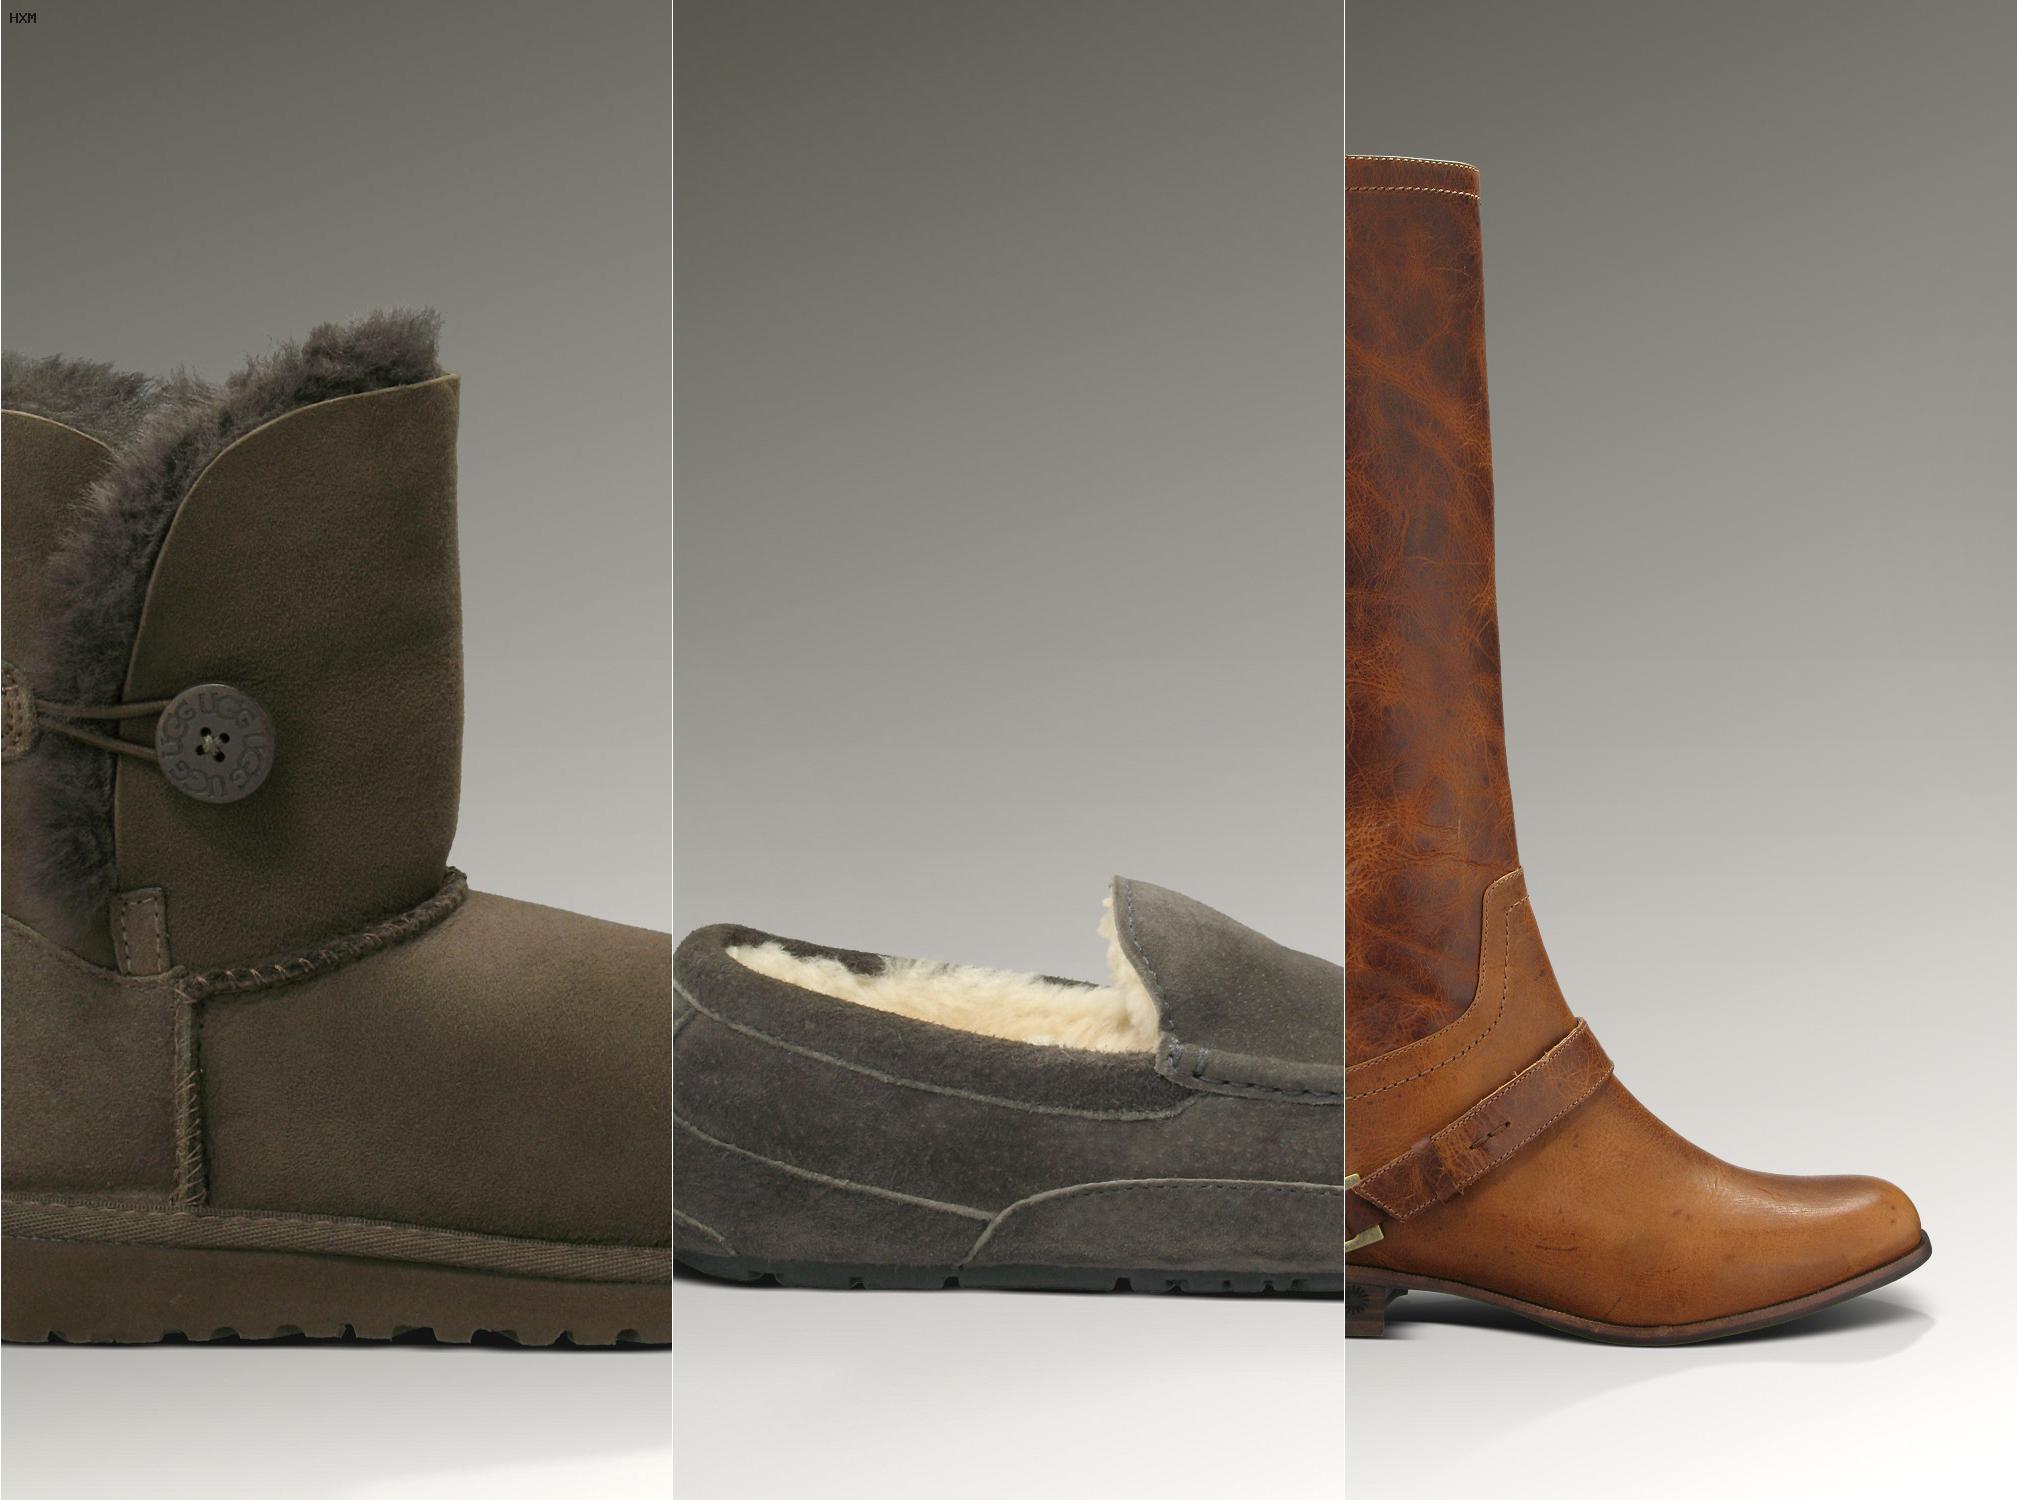 negozi ugg boots roma